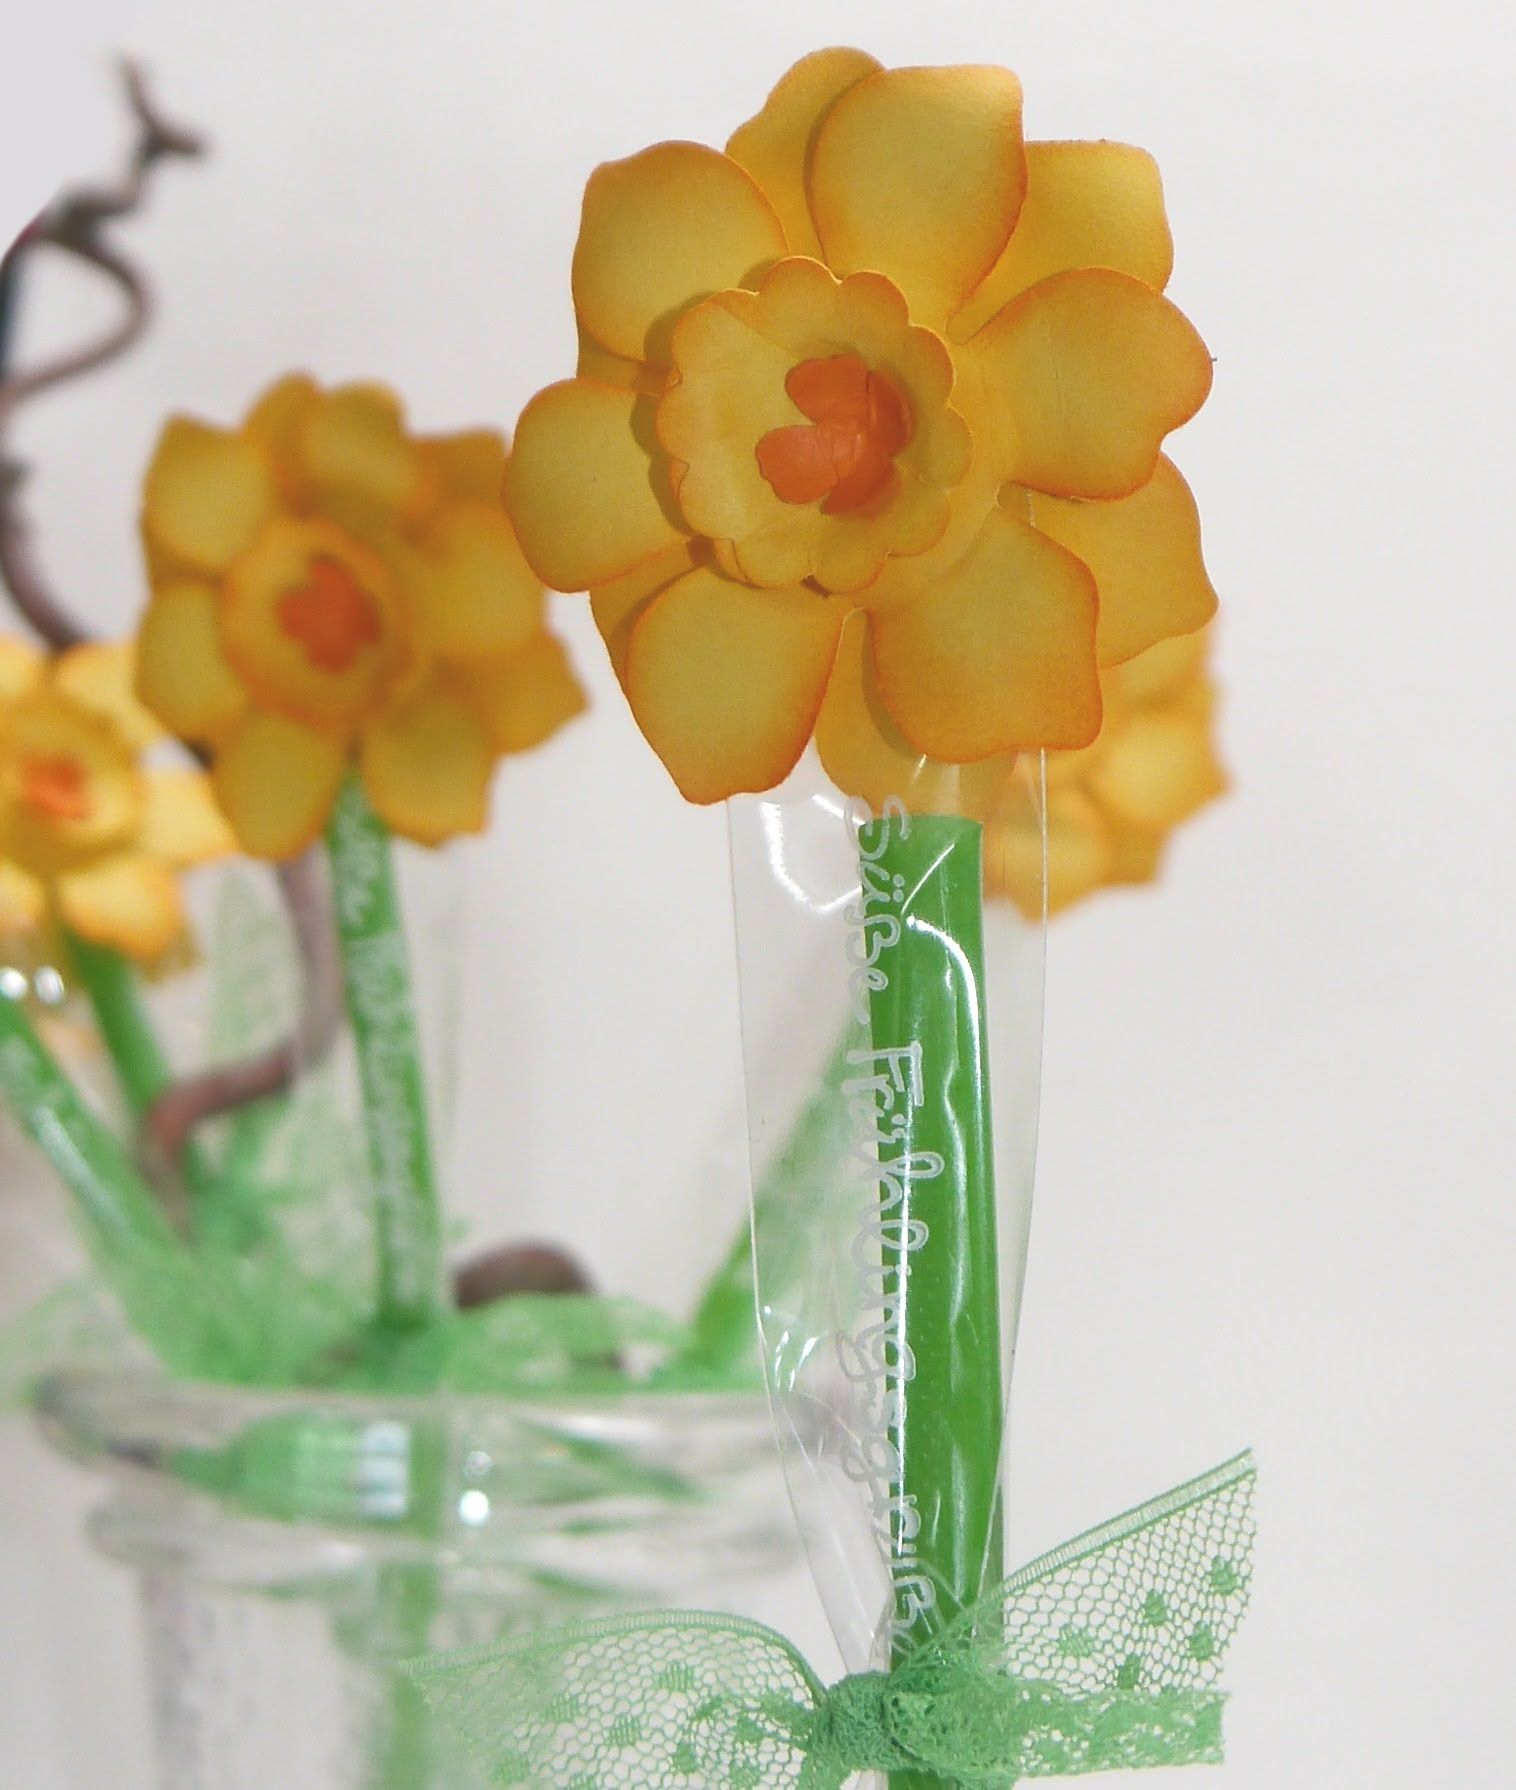 Osterglocke Mit Stanze Zierbluete Anleitung Flower Punches And